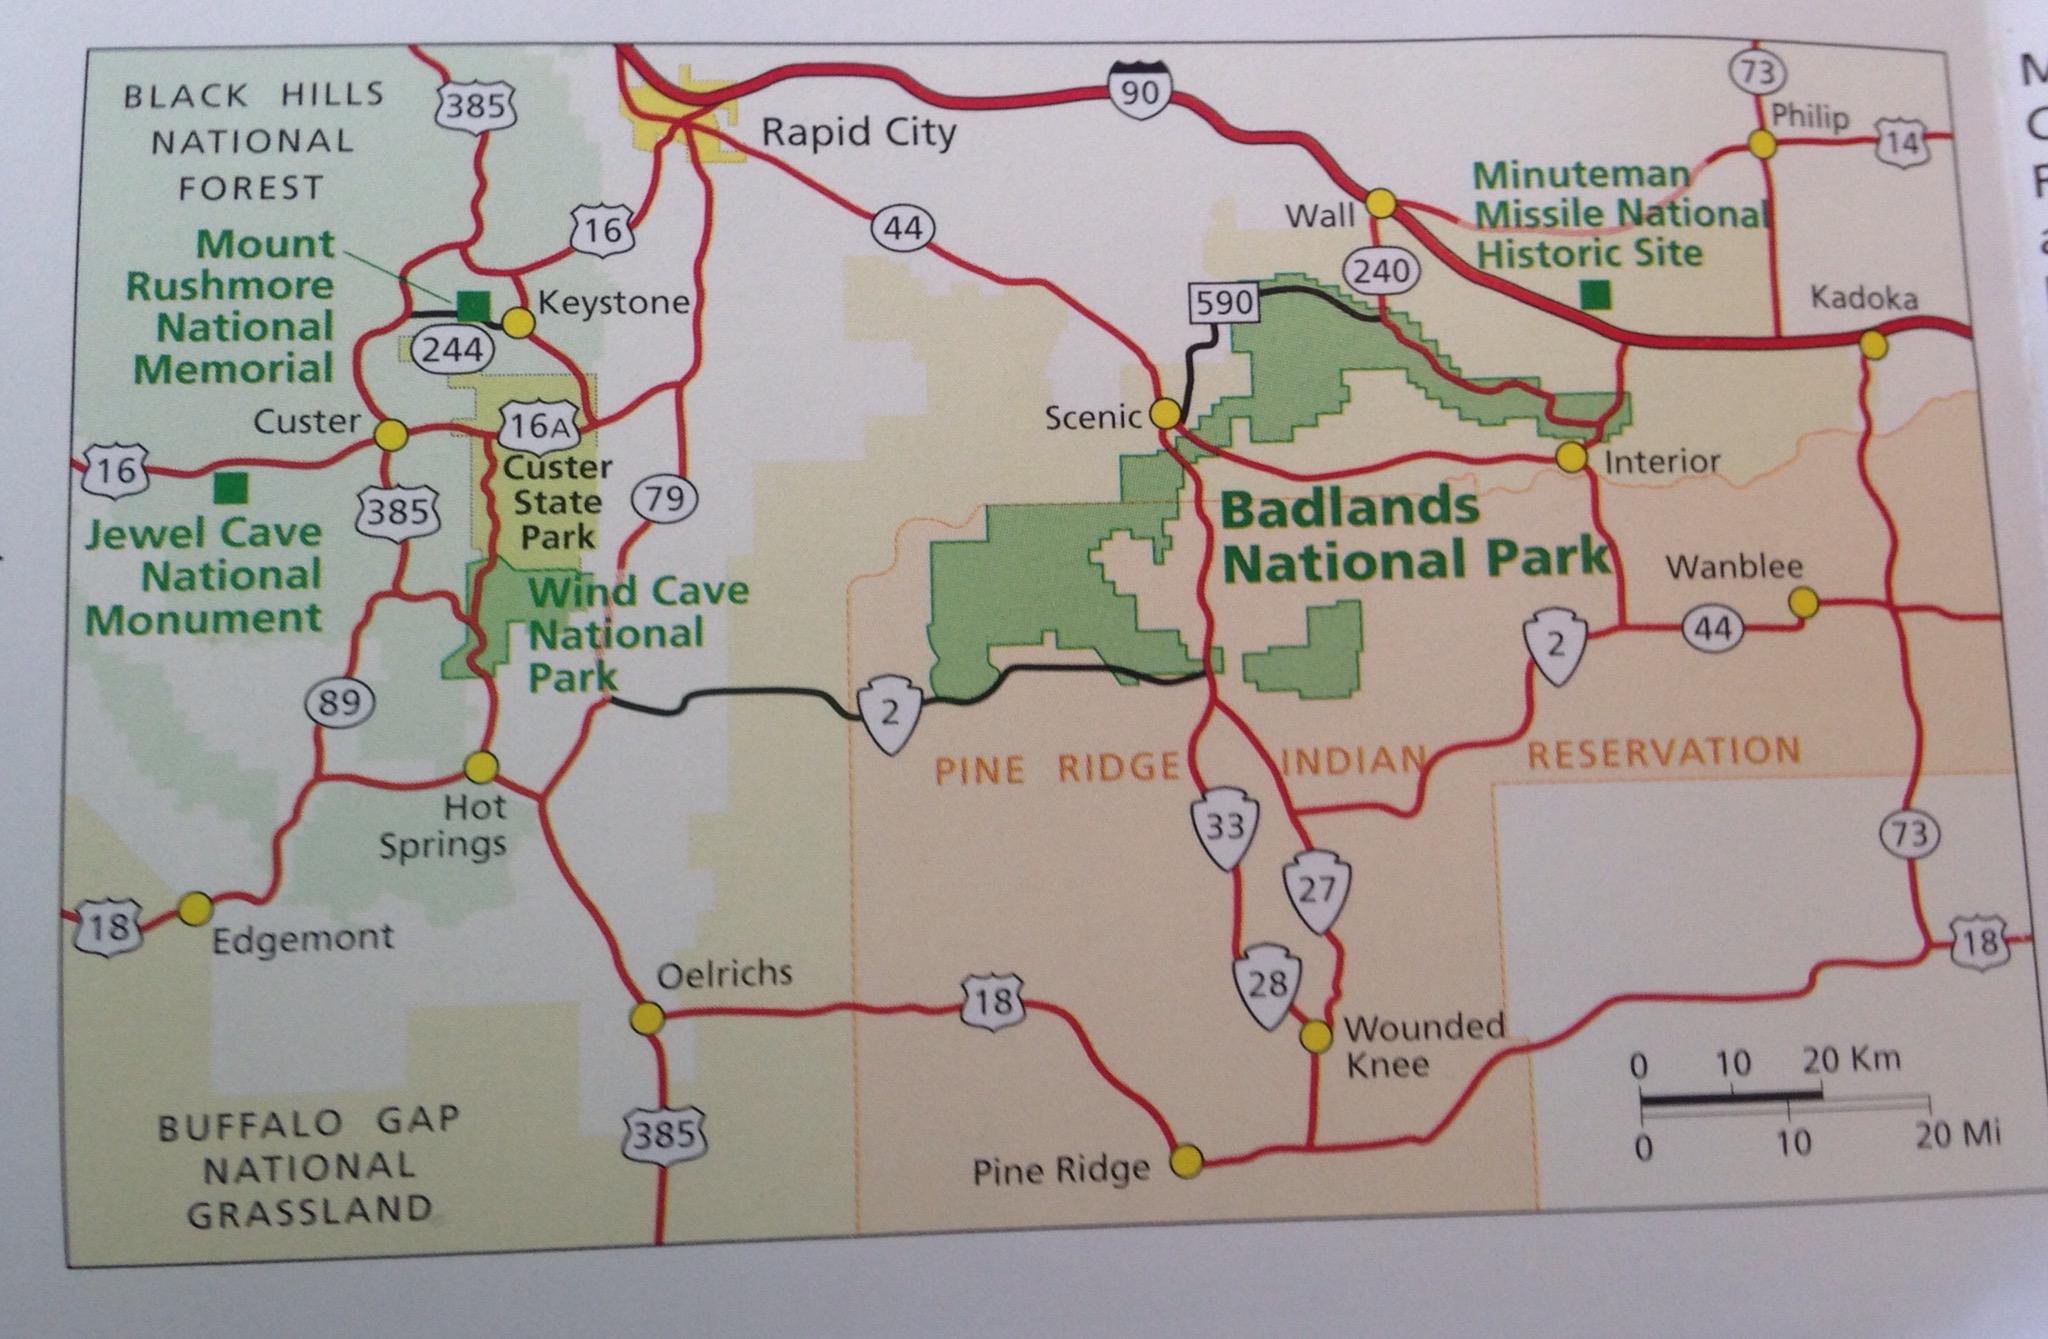 Badlands National Park thedirtyduo